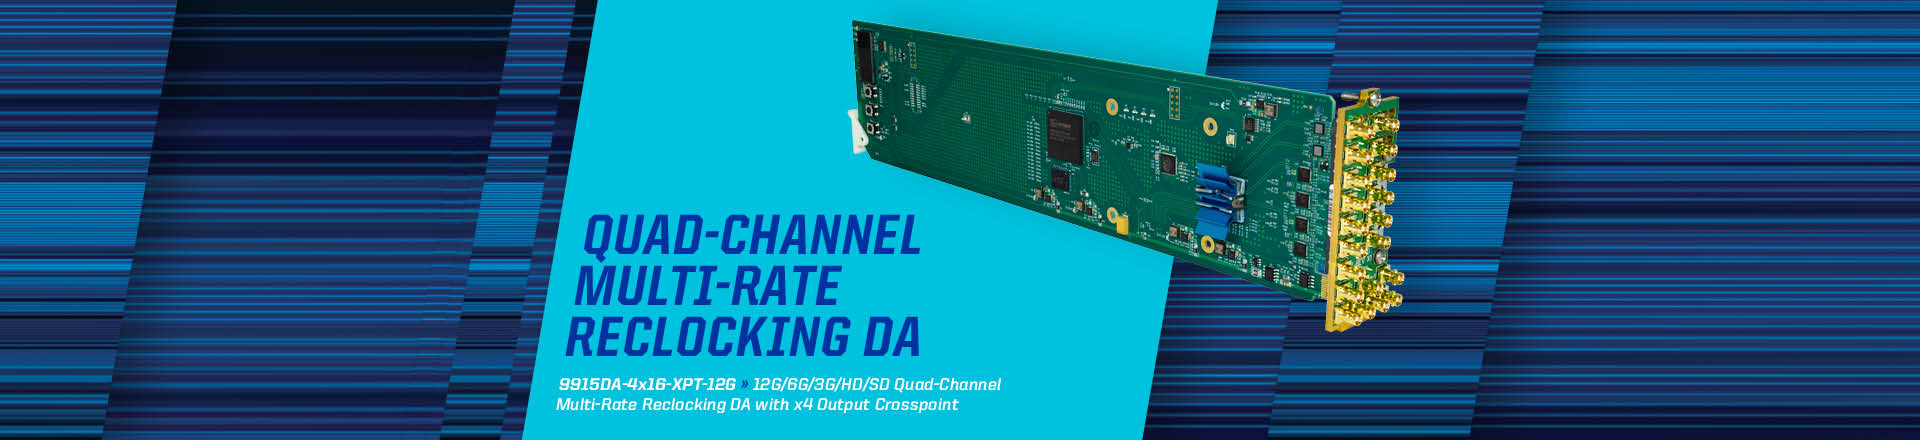 9915DA – Quad-Channel Multi-Rate Reclocking DA